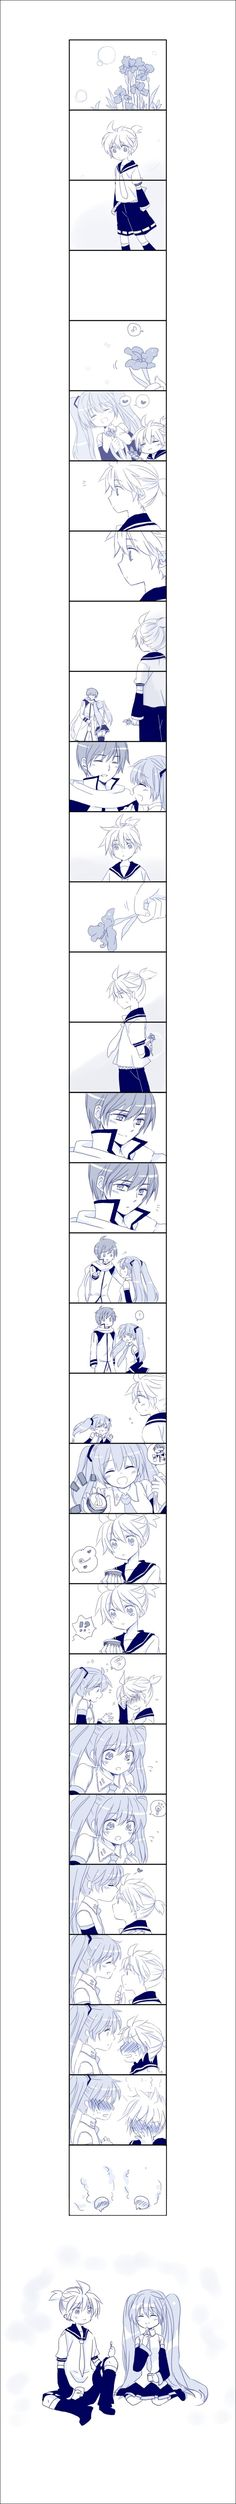 Vokaloid - Len and Miku - Comic